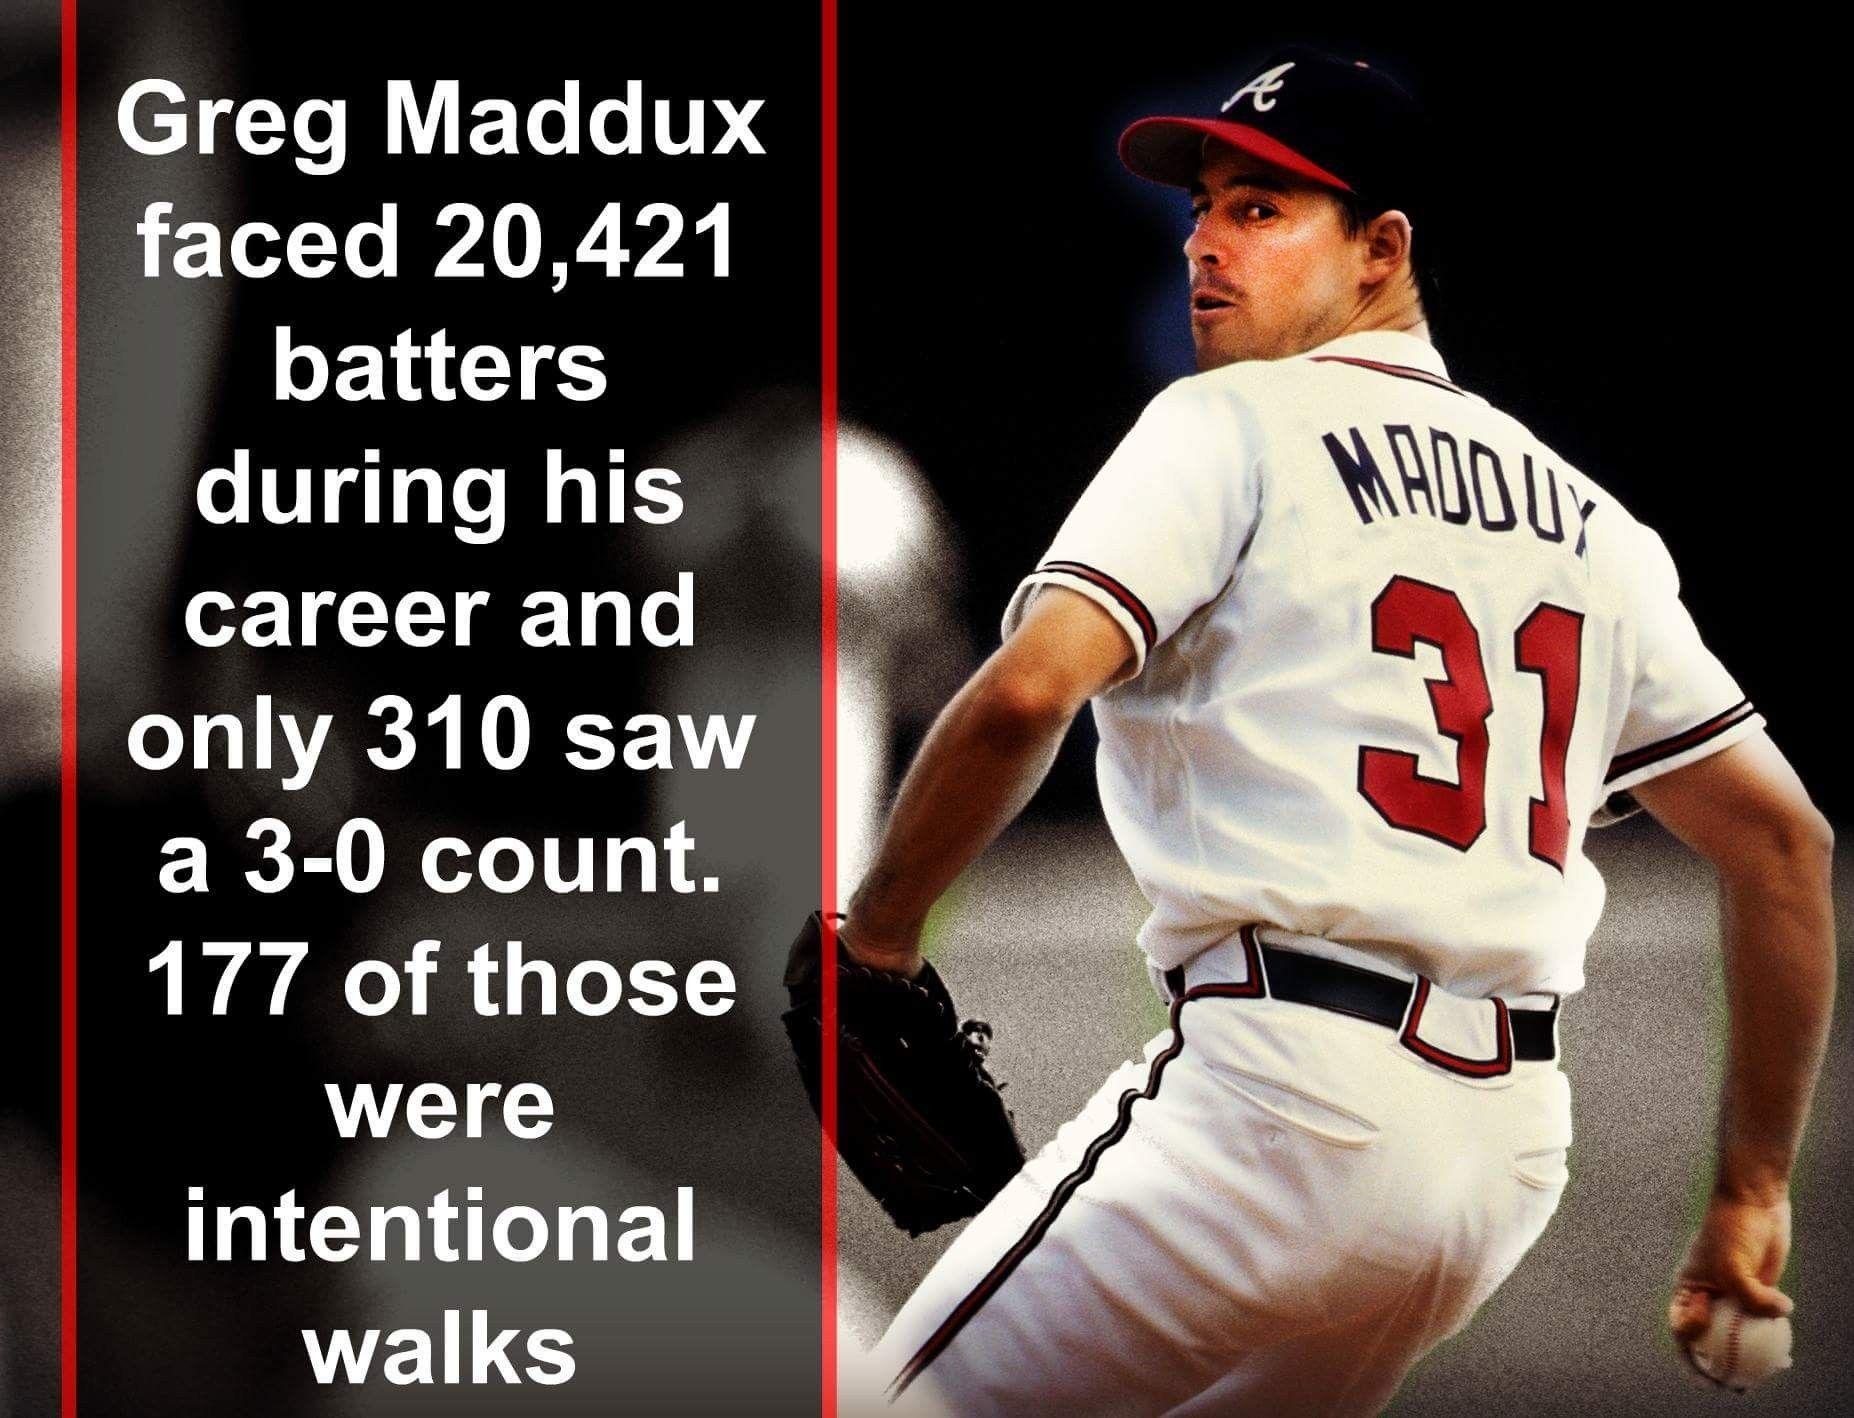 Mlb Legends Greg Maddux Atlanta Braves Baseball Baseball Pitcher